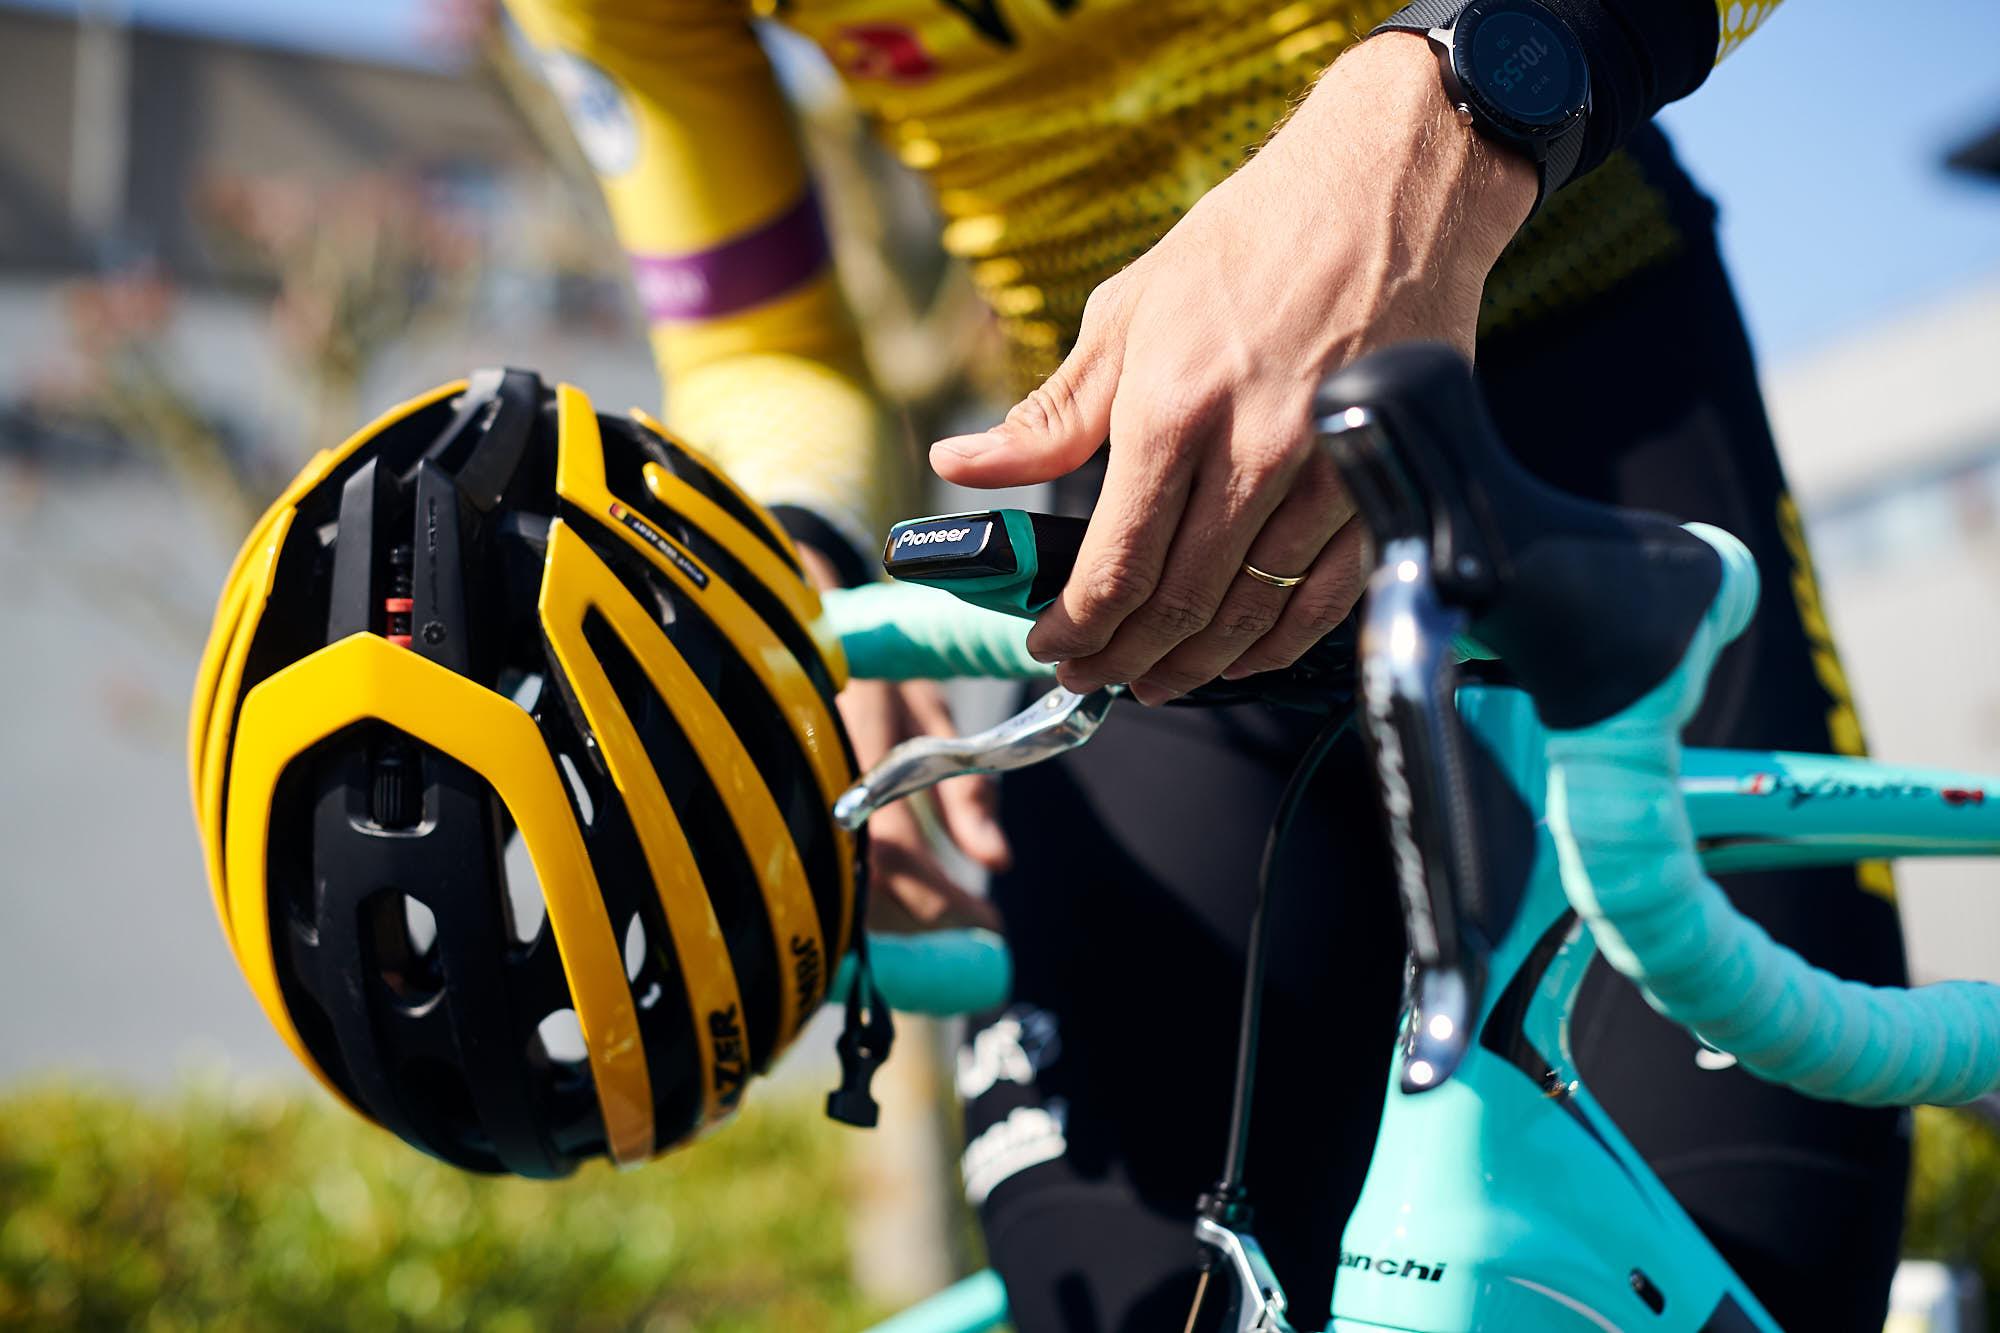 Putting a head unit on a Bianchi bike